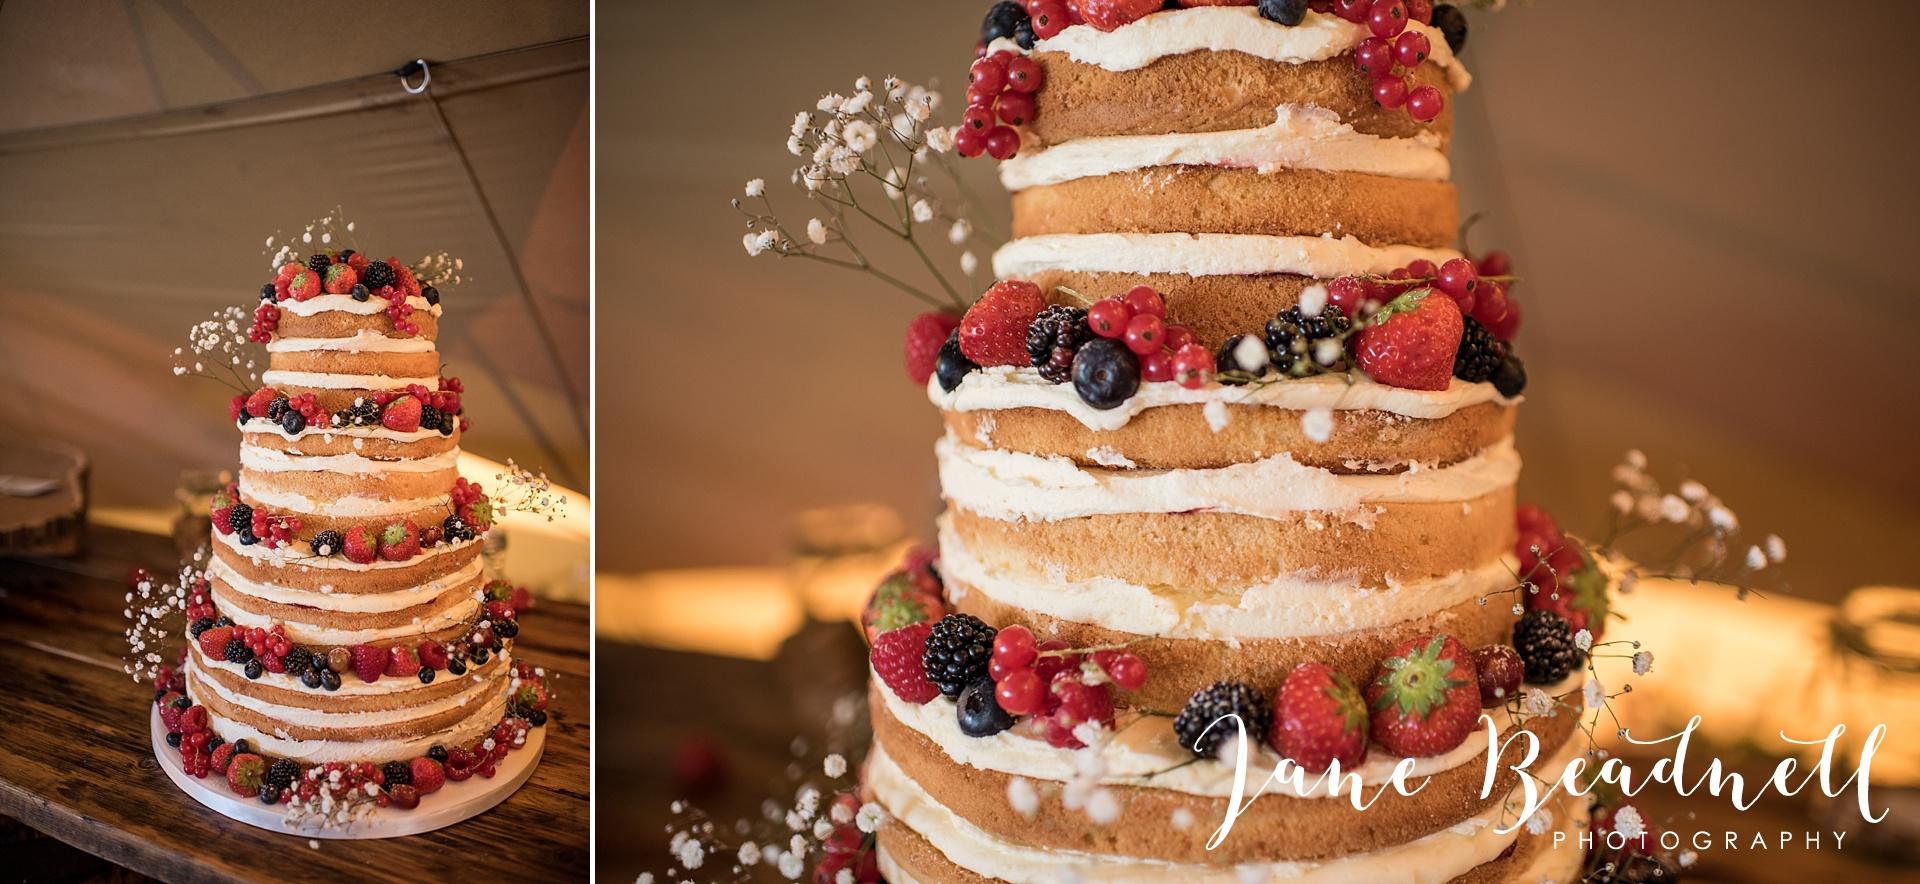 fine-art-wedding-photographer-jane-beadnell-yorkshire-wedding-photographer_0096